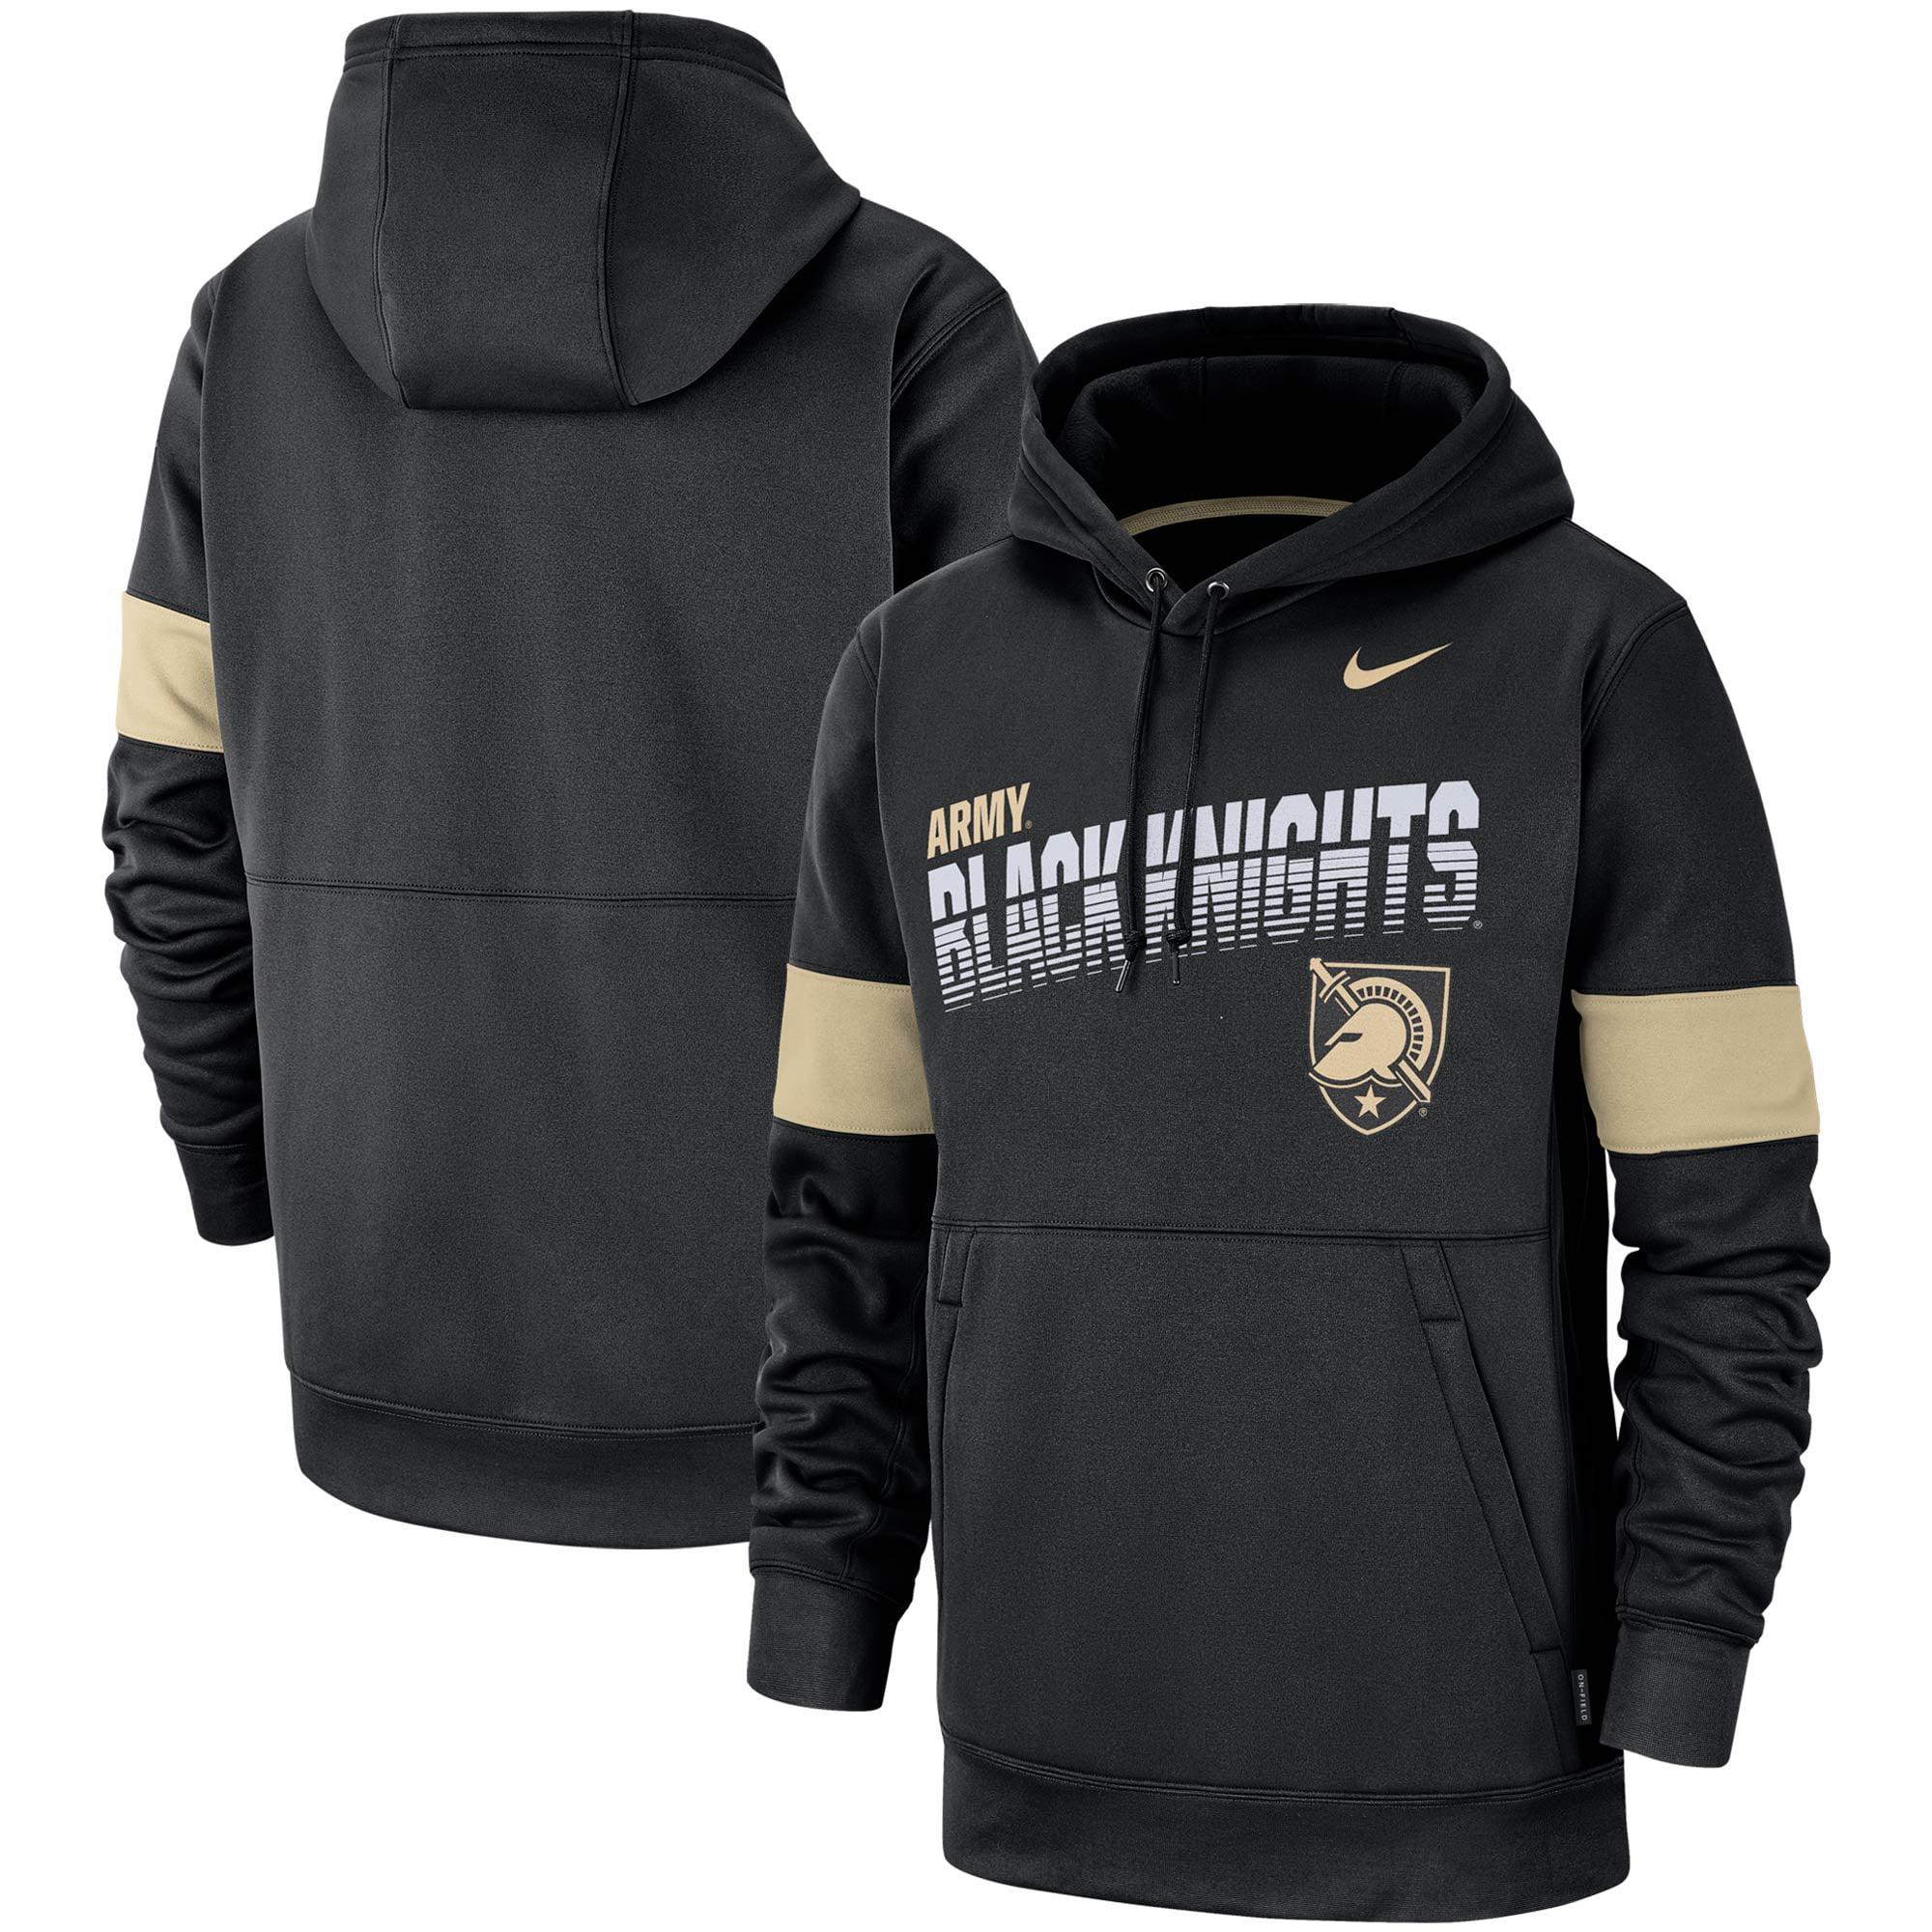 Army Black Knights Nike 2019 Sideline